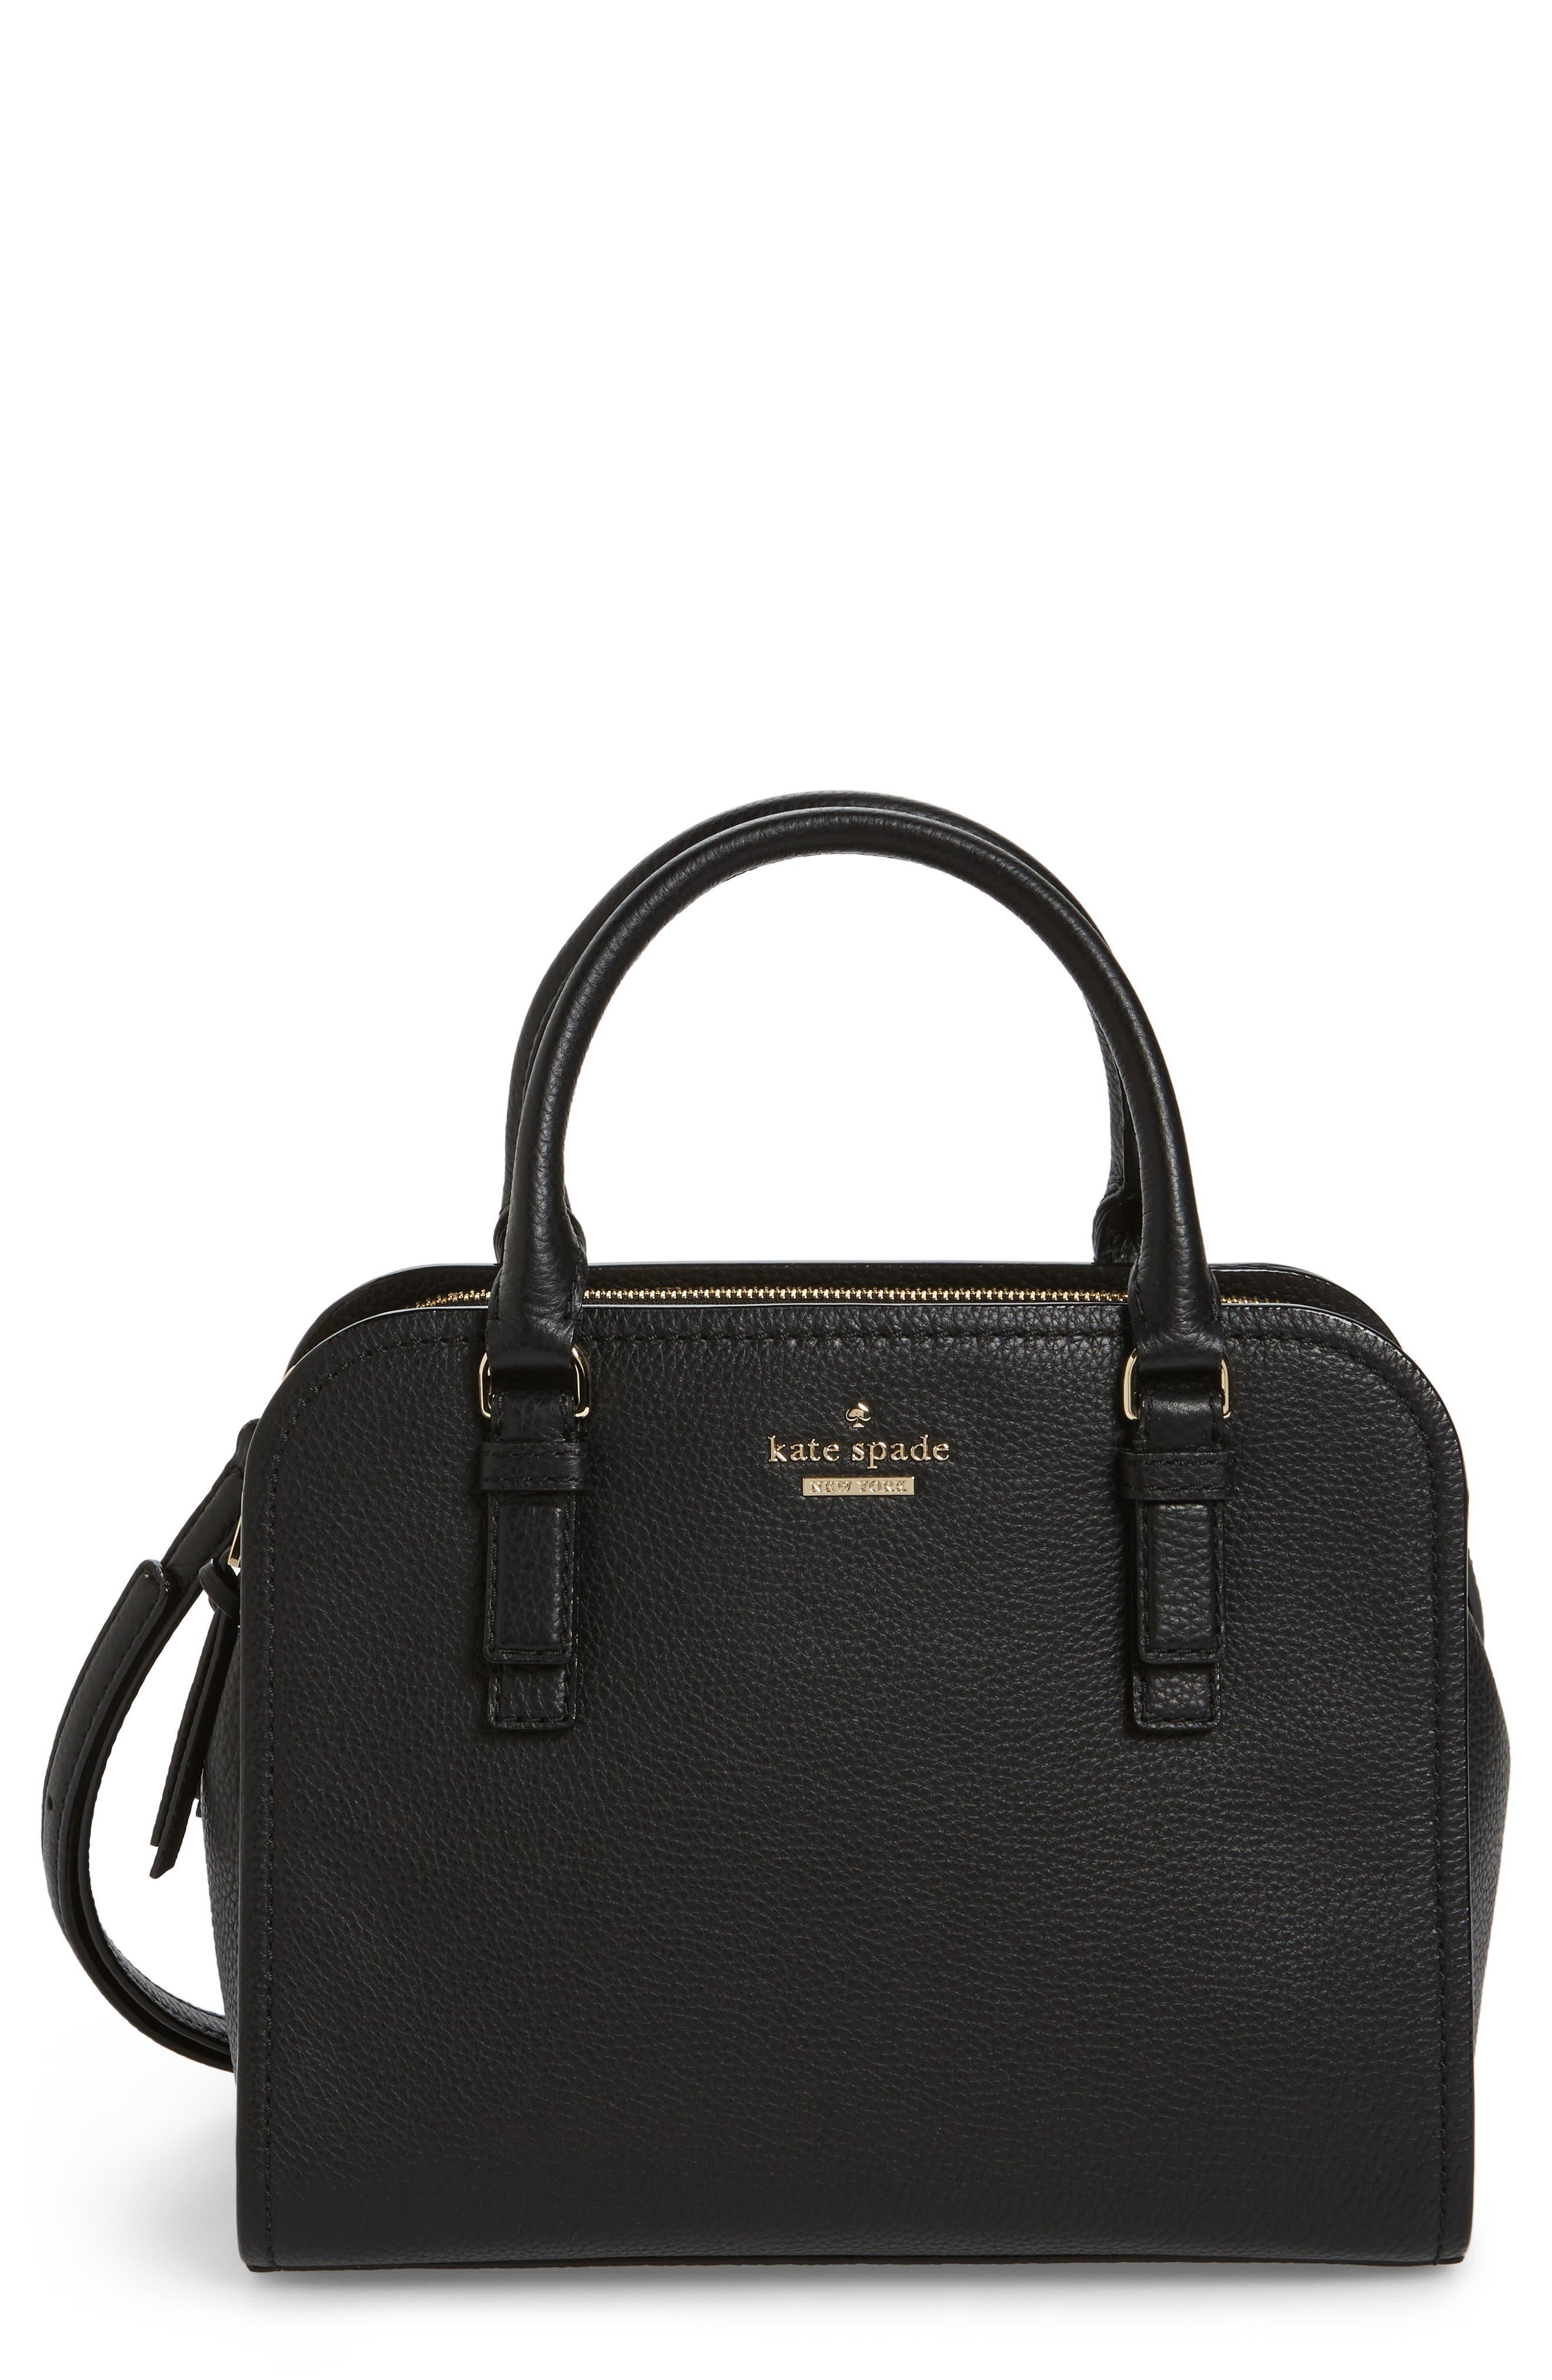 KATE SPADE NEW YORK jackson street small kiernan leather top handle satchel